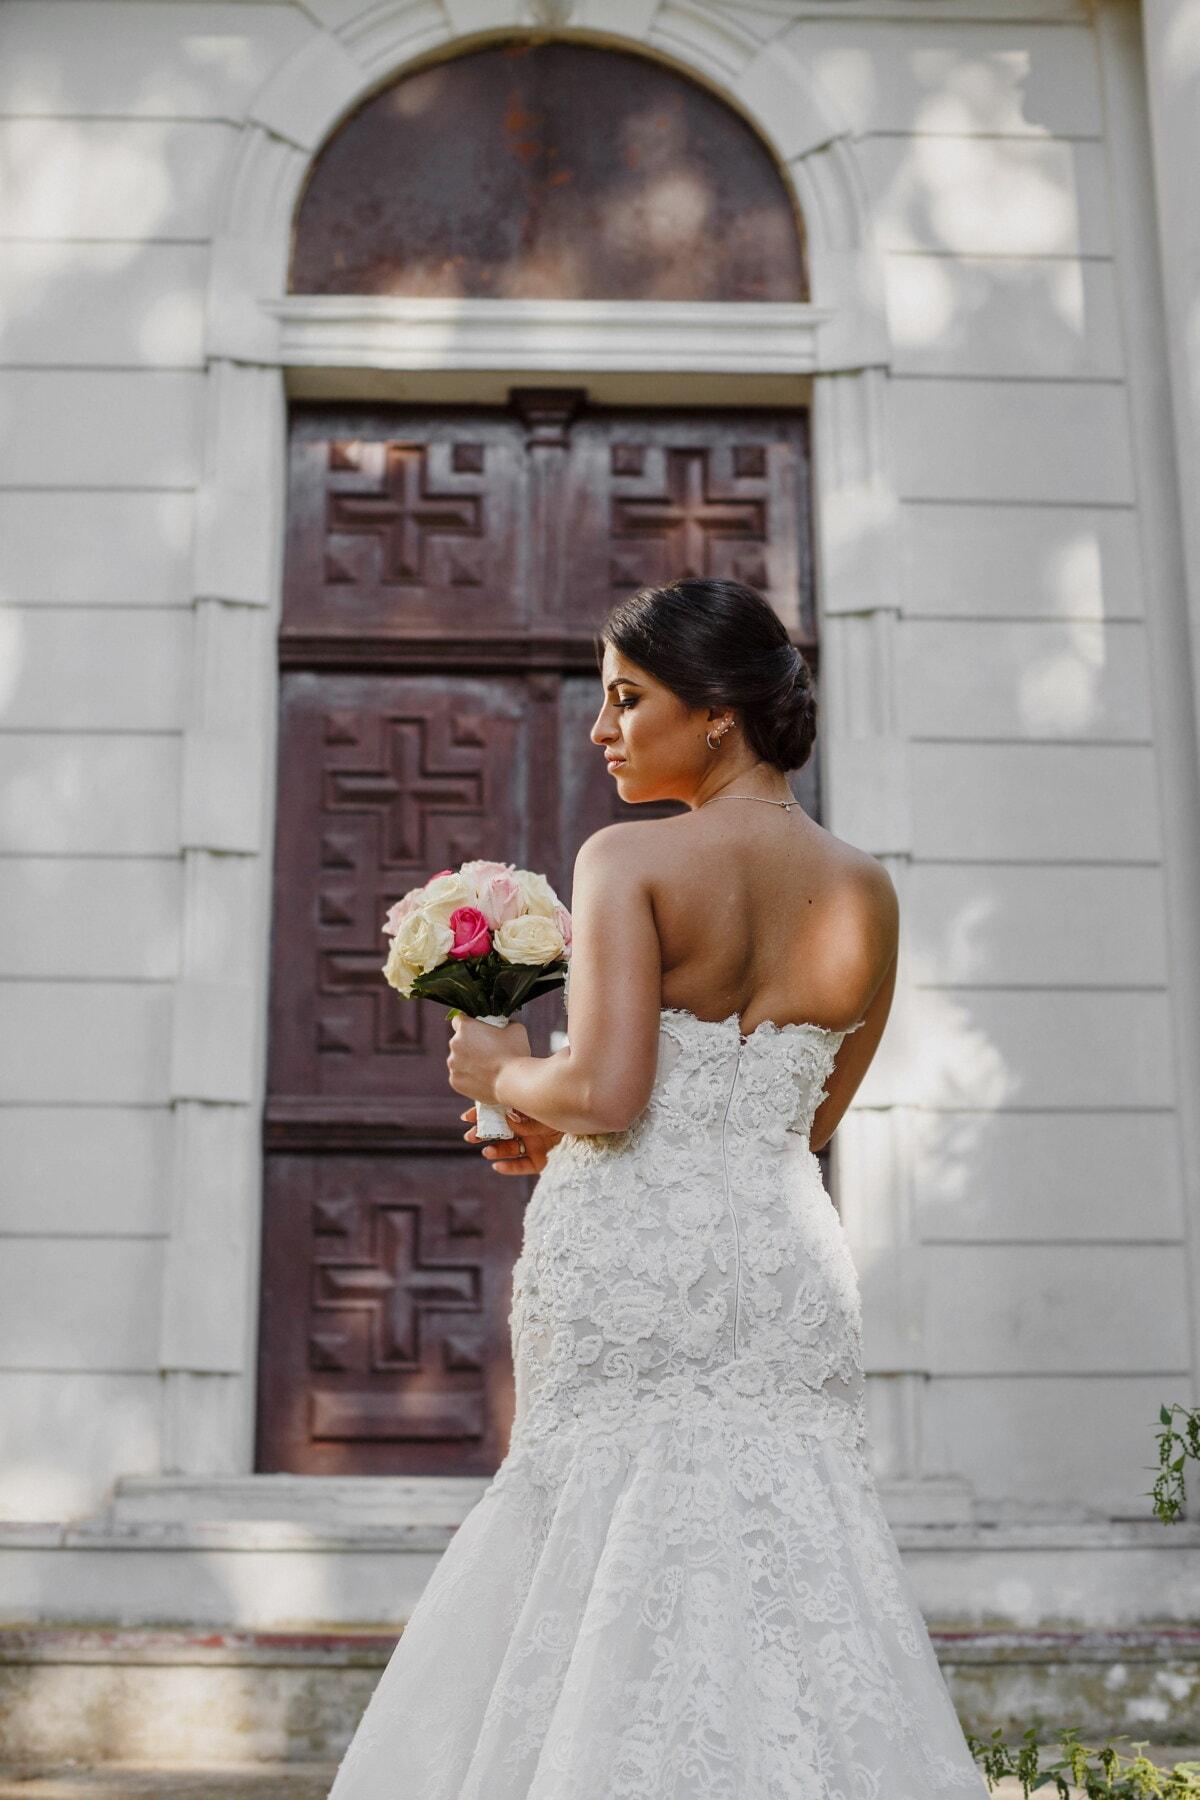 vestido de novia, posando, novia, hombro, boda, vertical, personas, chica, mujer, al aire libre